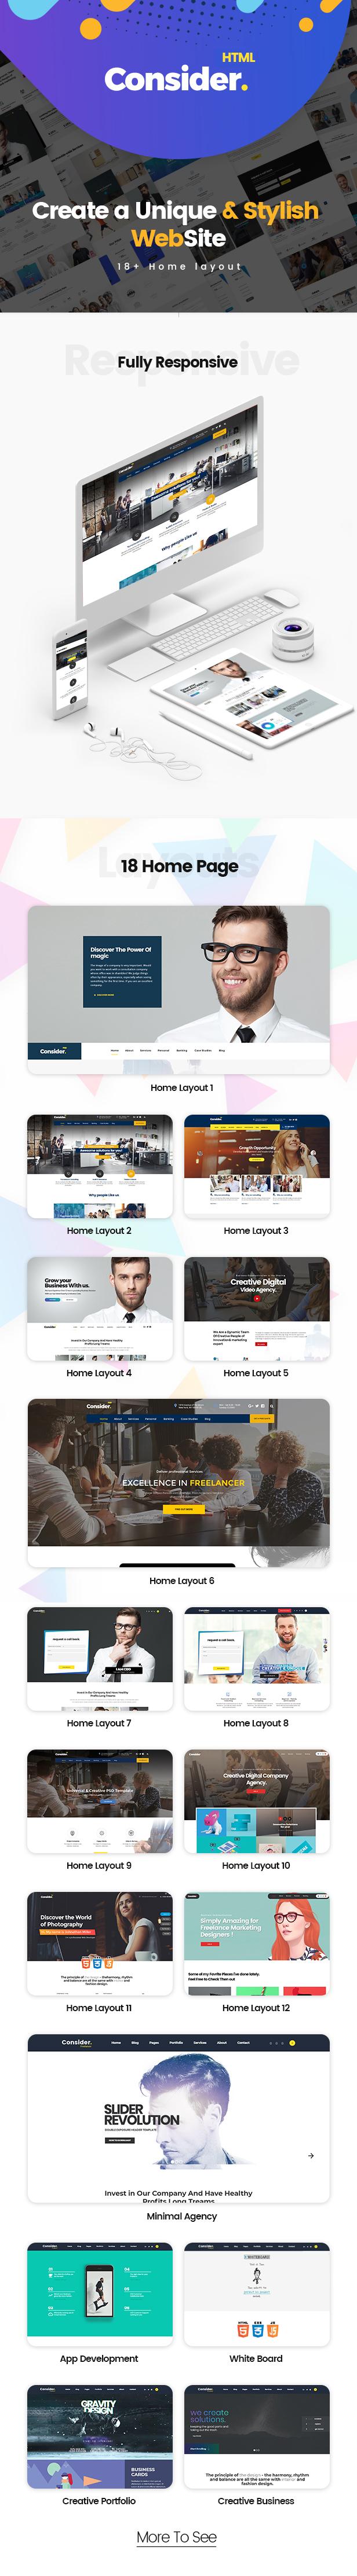 Consider - Multi-Purpose Responsive HTML5 Template - 1